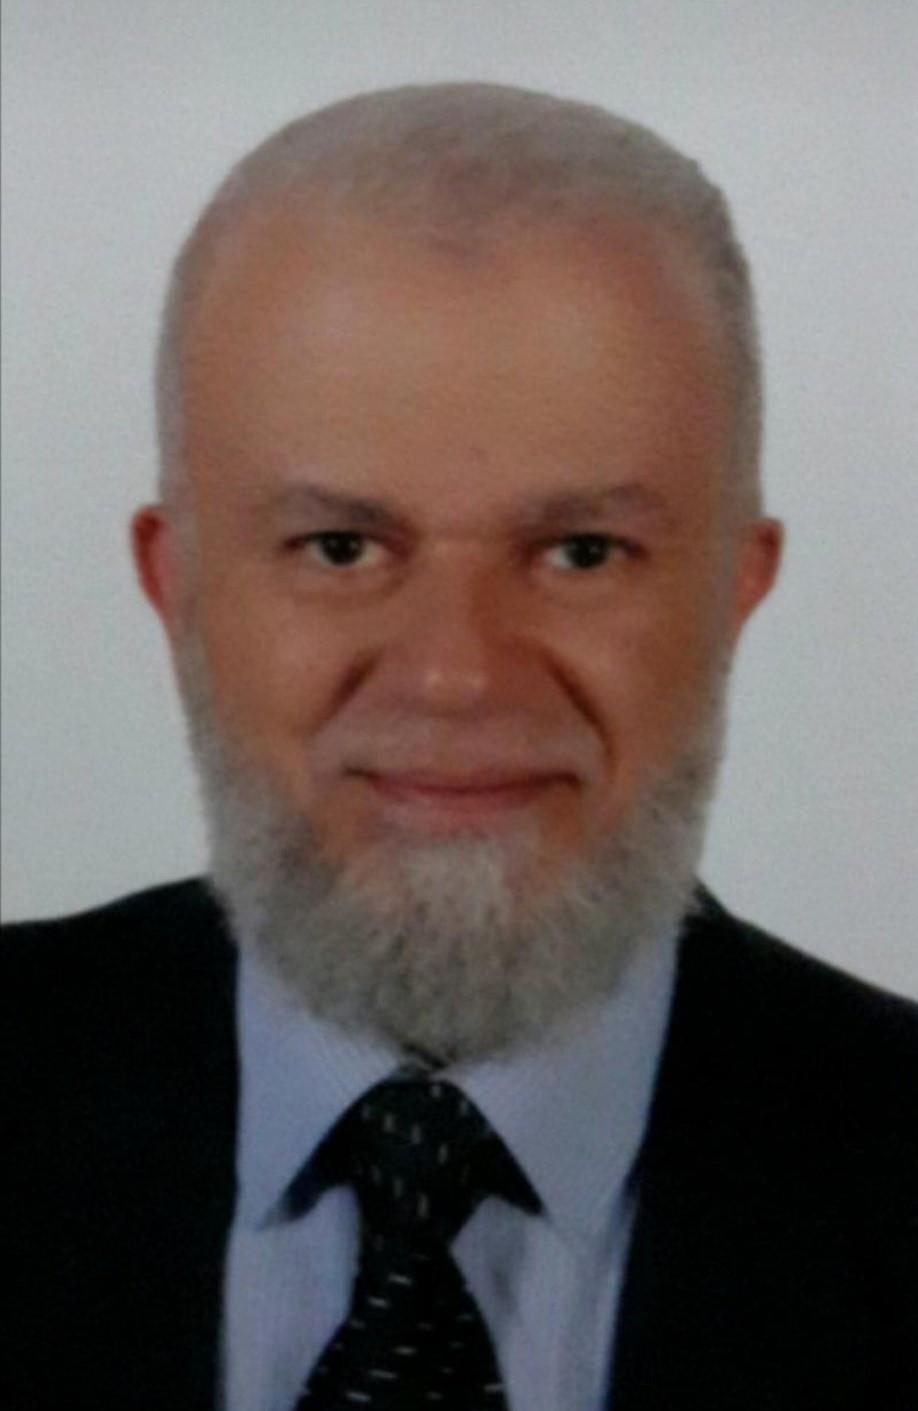 Ahmed Abd Allah Ibrahim Darwish